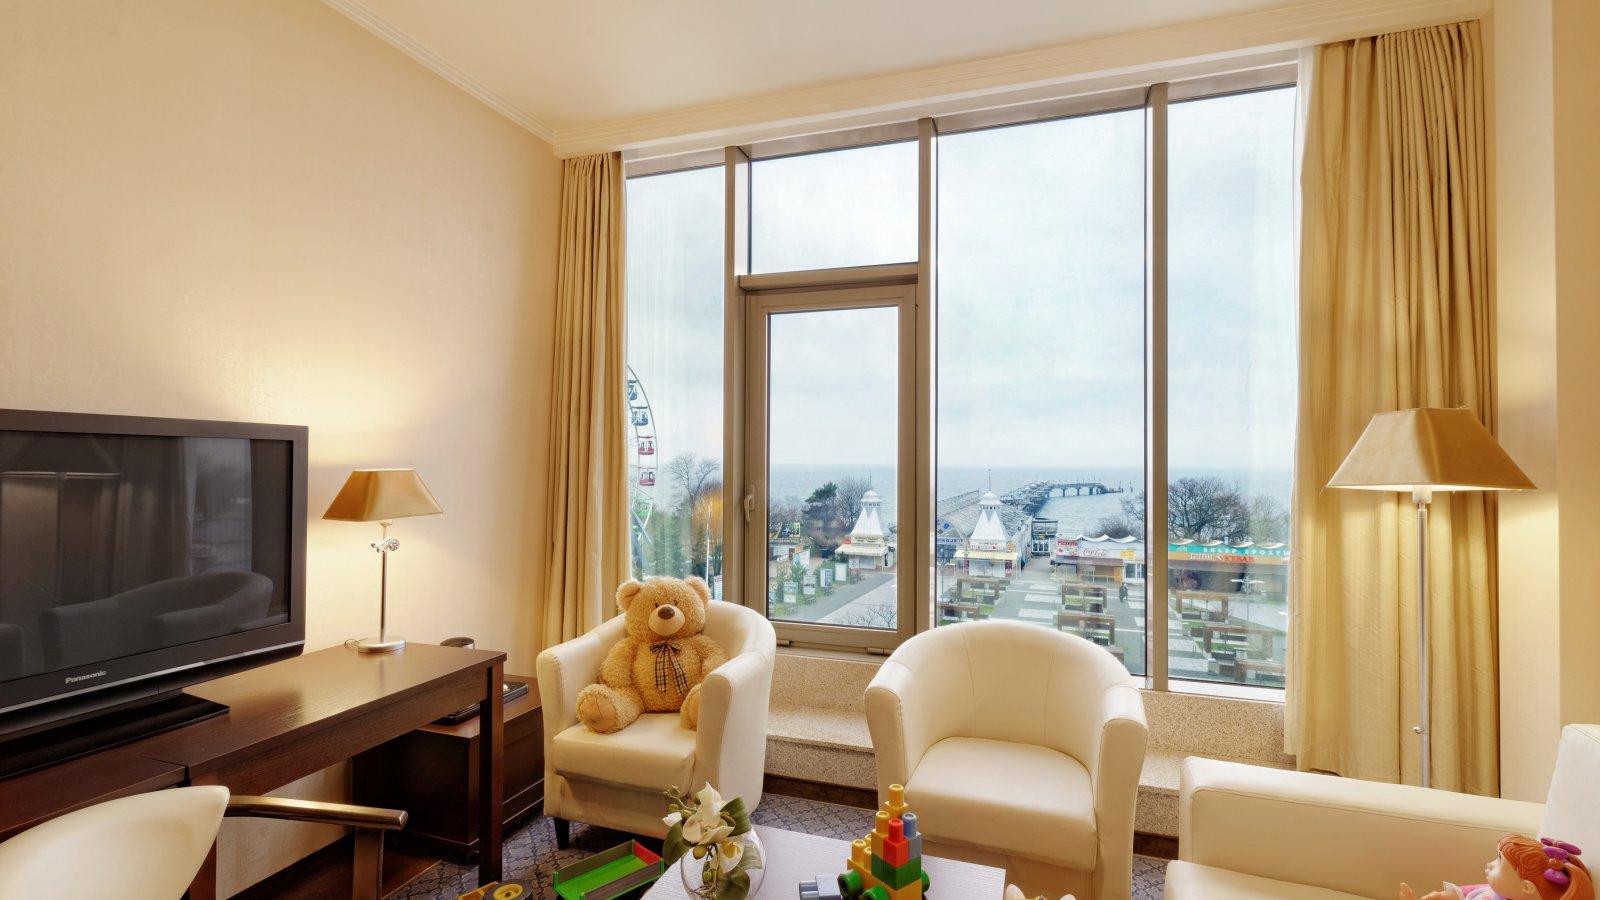 Hotell Aurora room